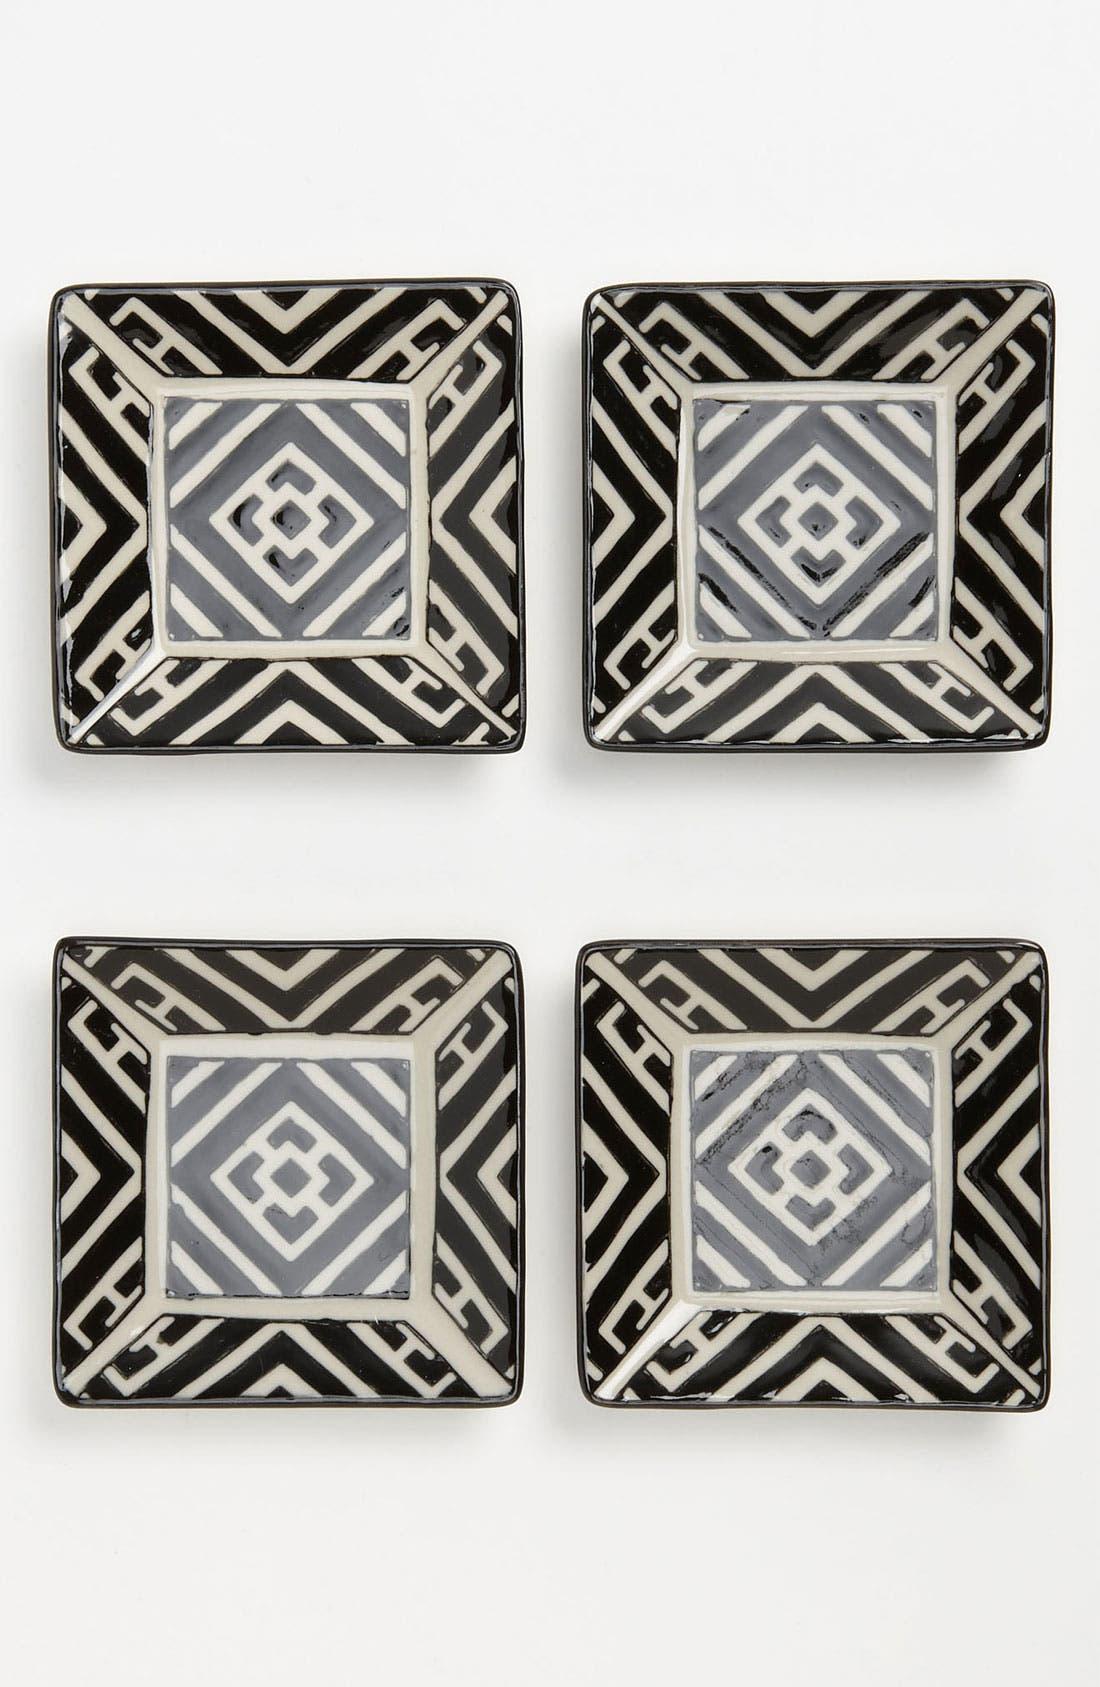 Main Image - Black & White Appetizer Plates (Set of 4)